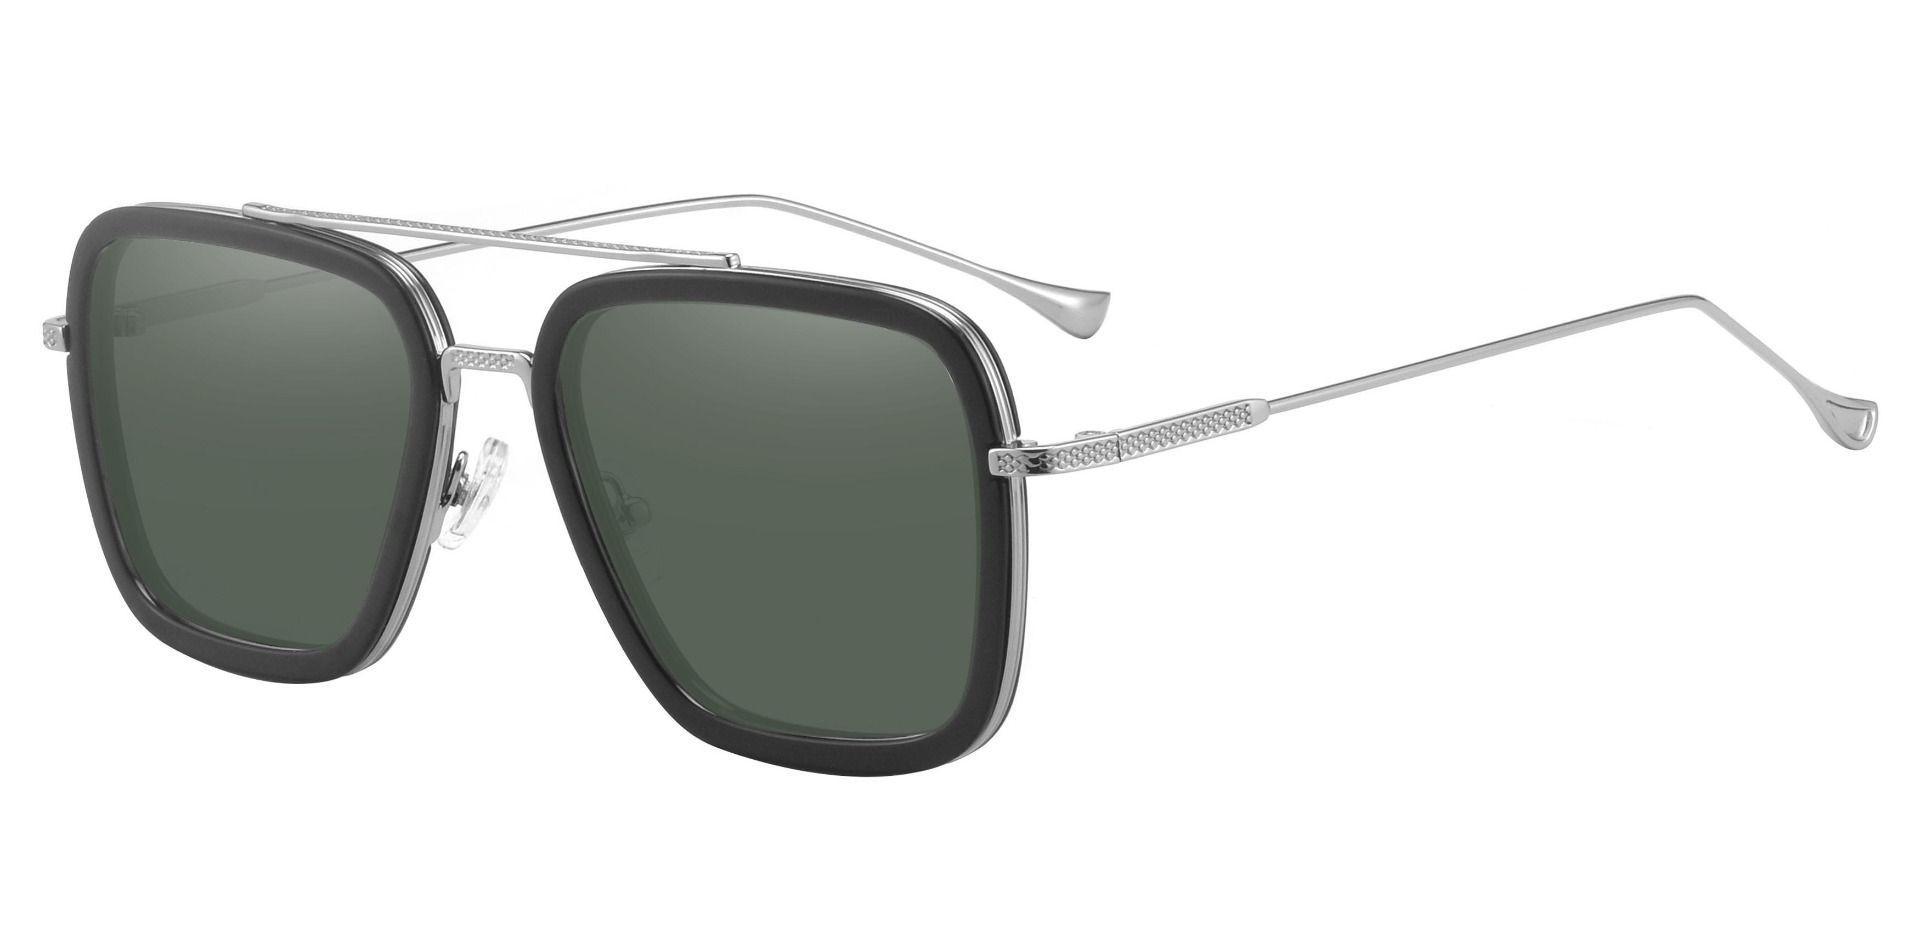 Cruz Aviator Reading Sunglasses - Black Frame With Green Lenses